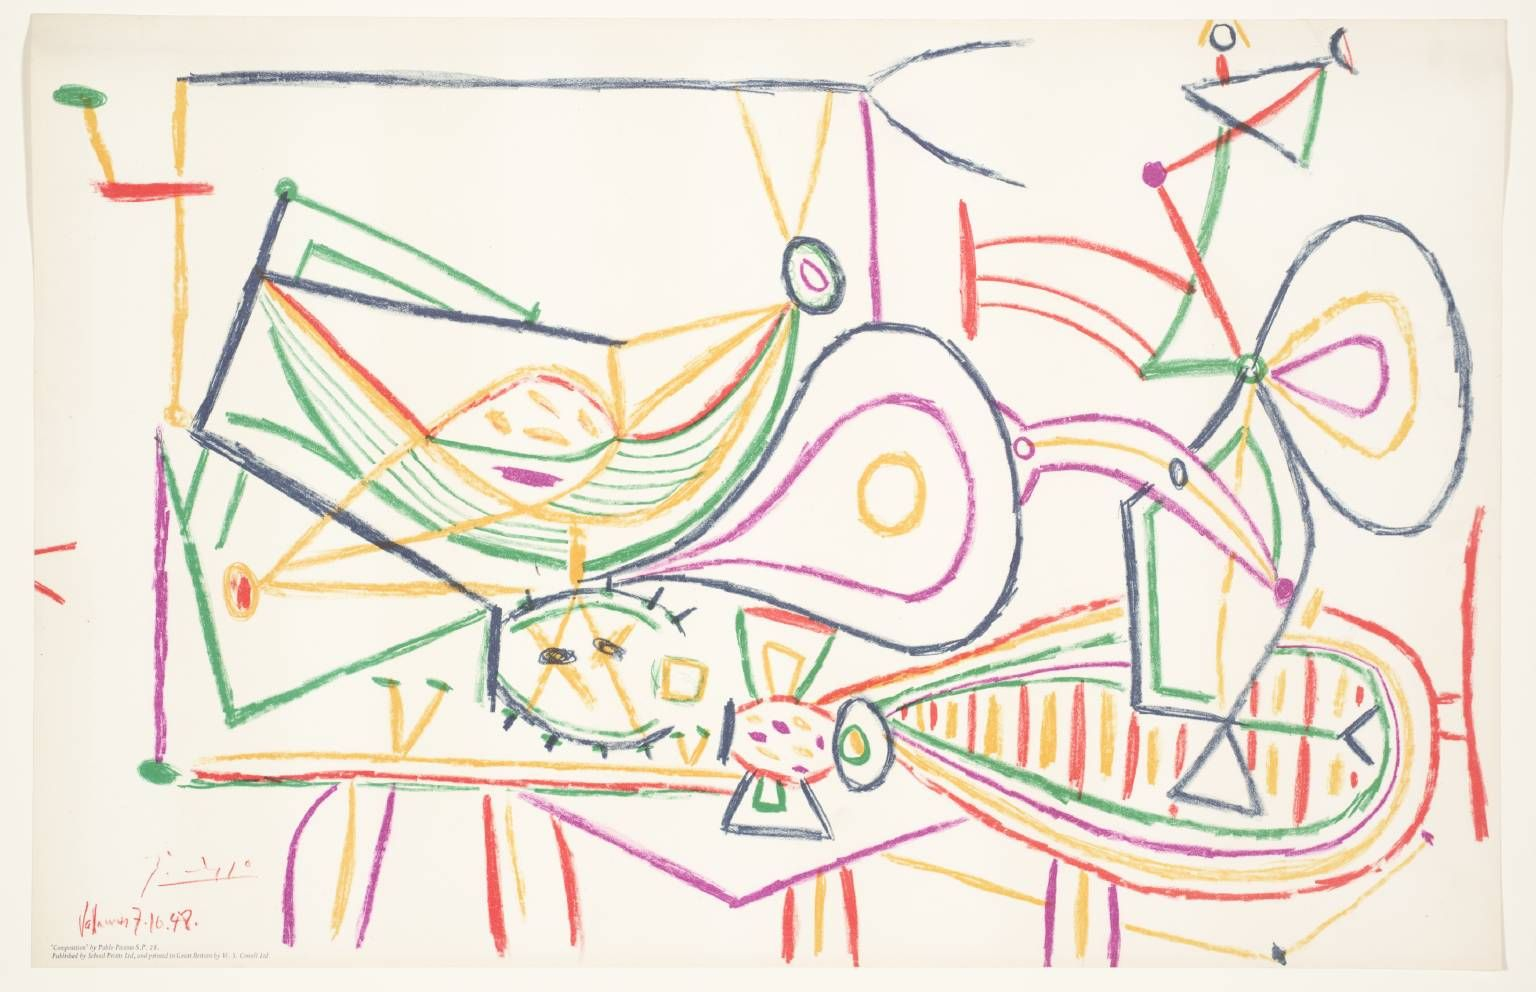 Pablo Picasso Composition Succession Picasso